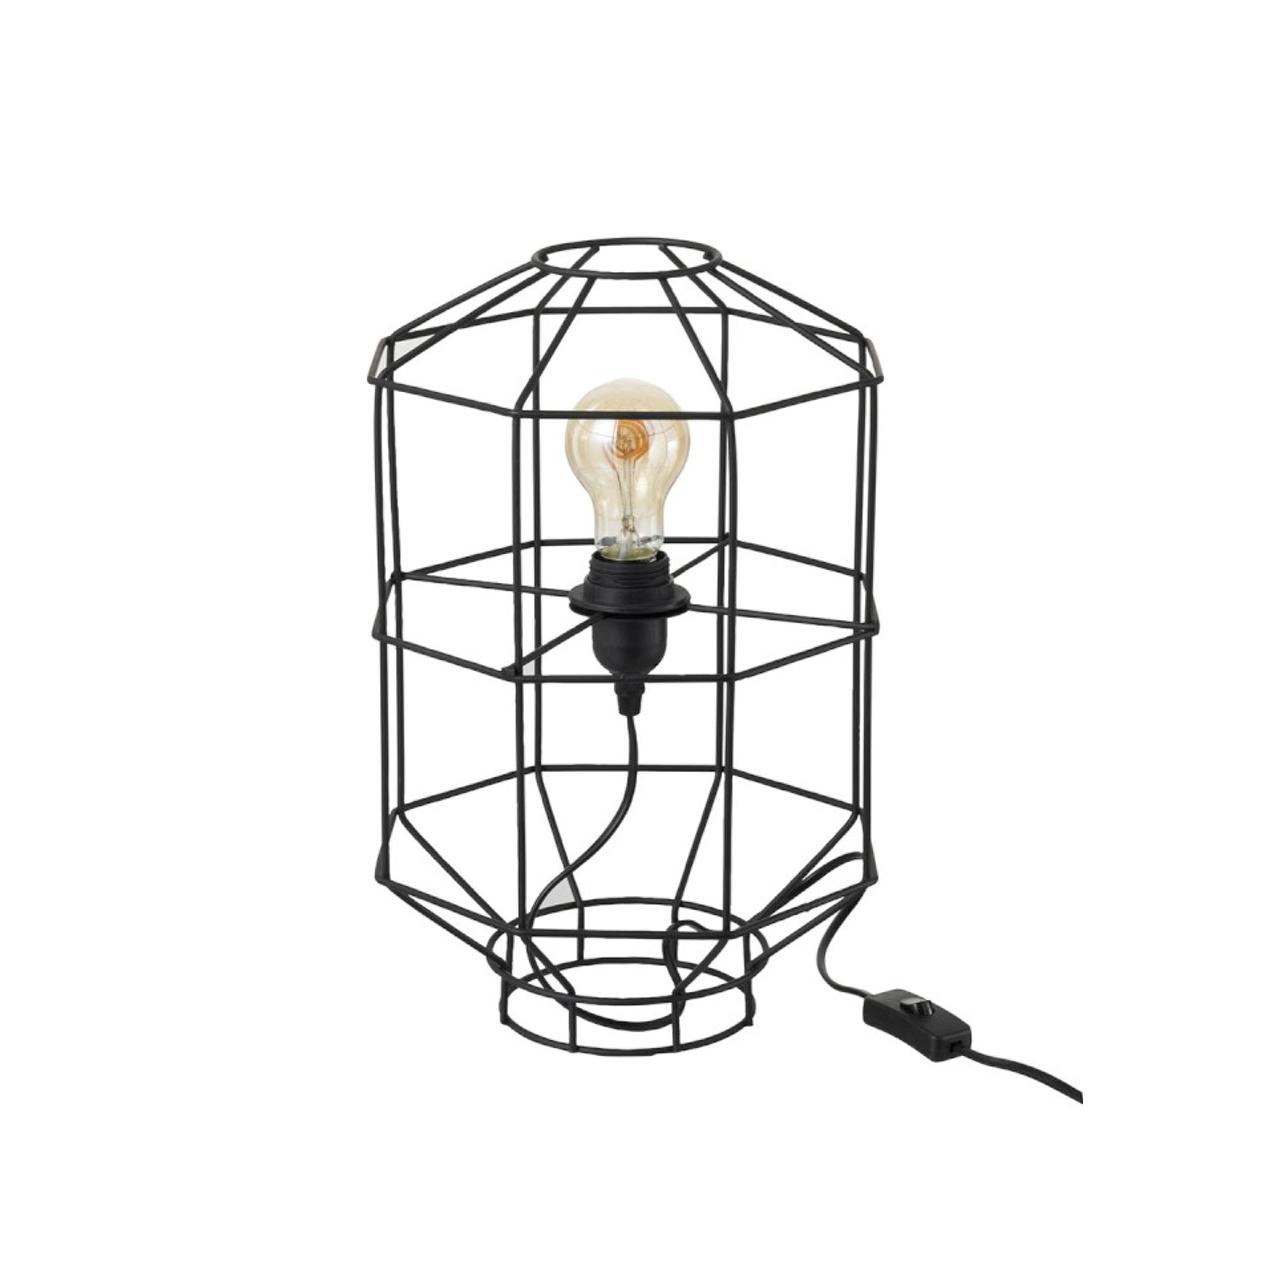 J-line Tafellamp/Vloerlamp draadlamp zwart metaal (24x24x39cm)-93788-5415203937889